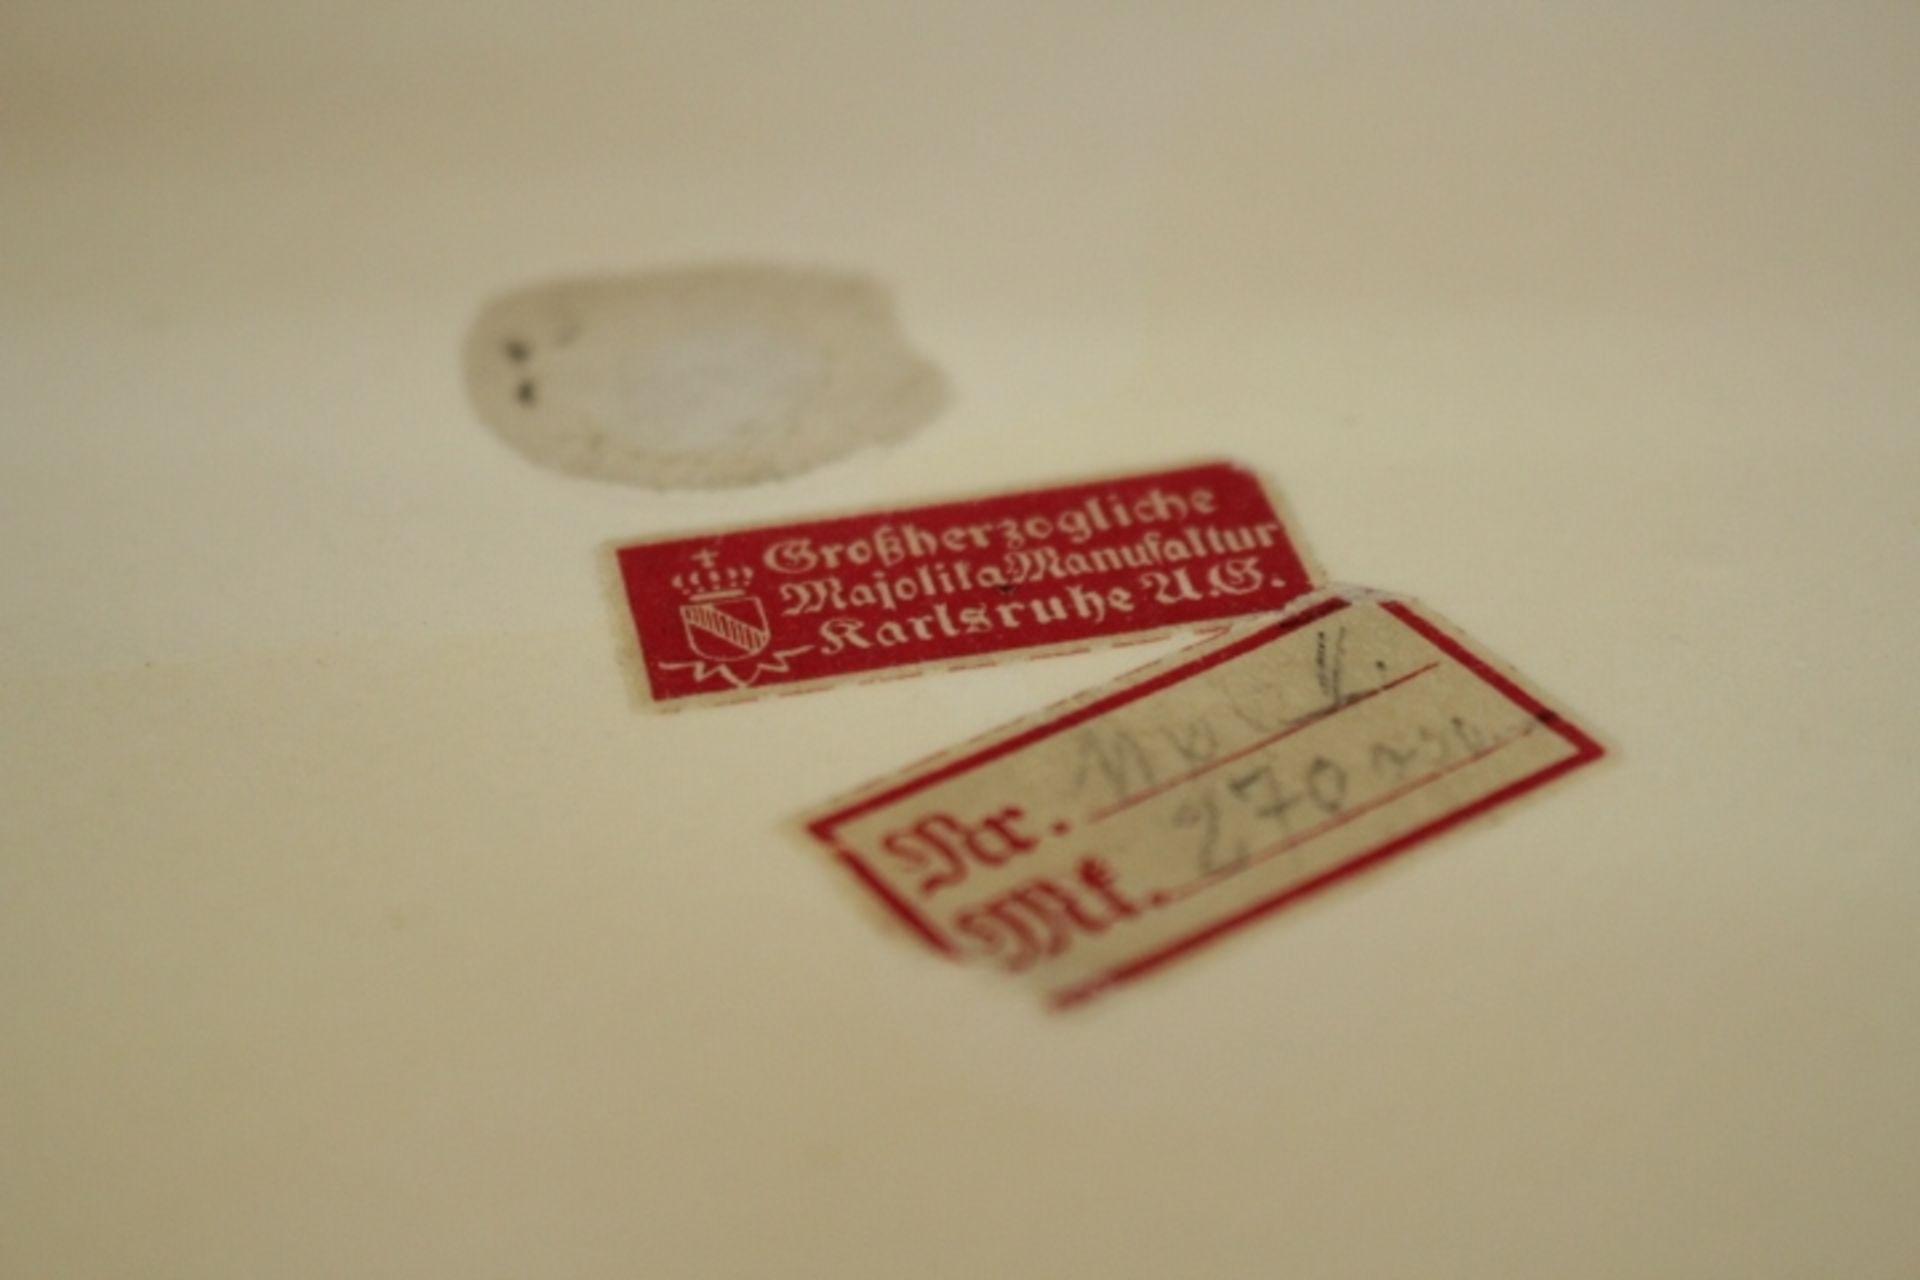 Karlsruher Majolika Schale Kinderreigen Entwurf:Wilhelm Süs 1910 -1930 Keramik Prägenr.1166 - Ec11 - Bild 3 aus 3